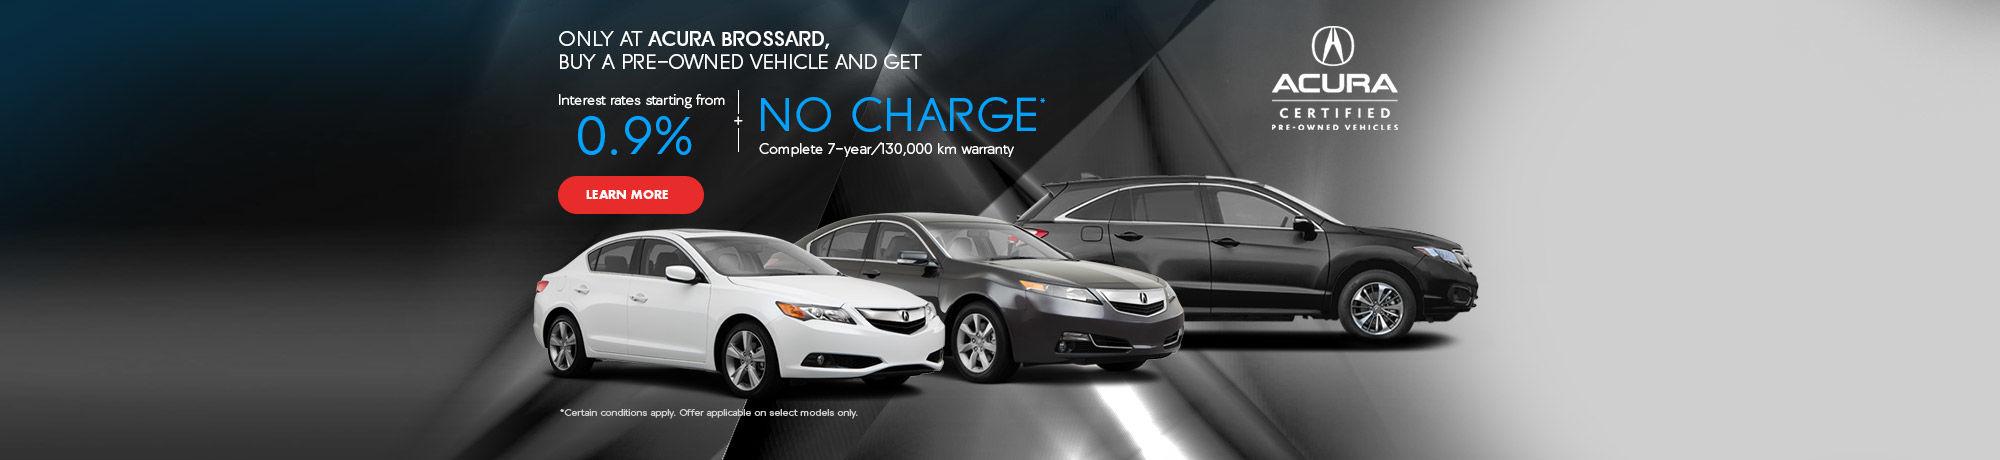 Financez un véhicule Acura d'occasion